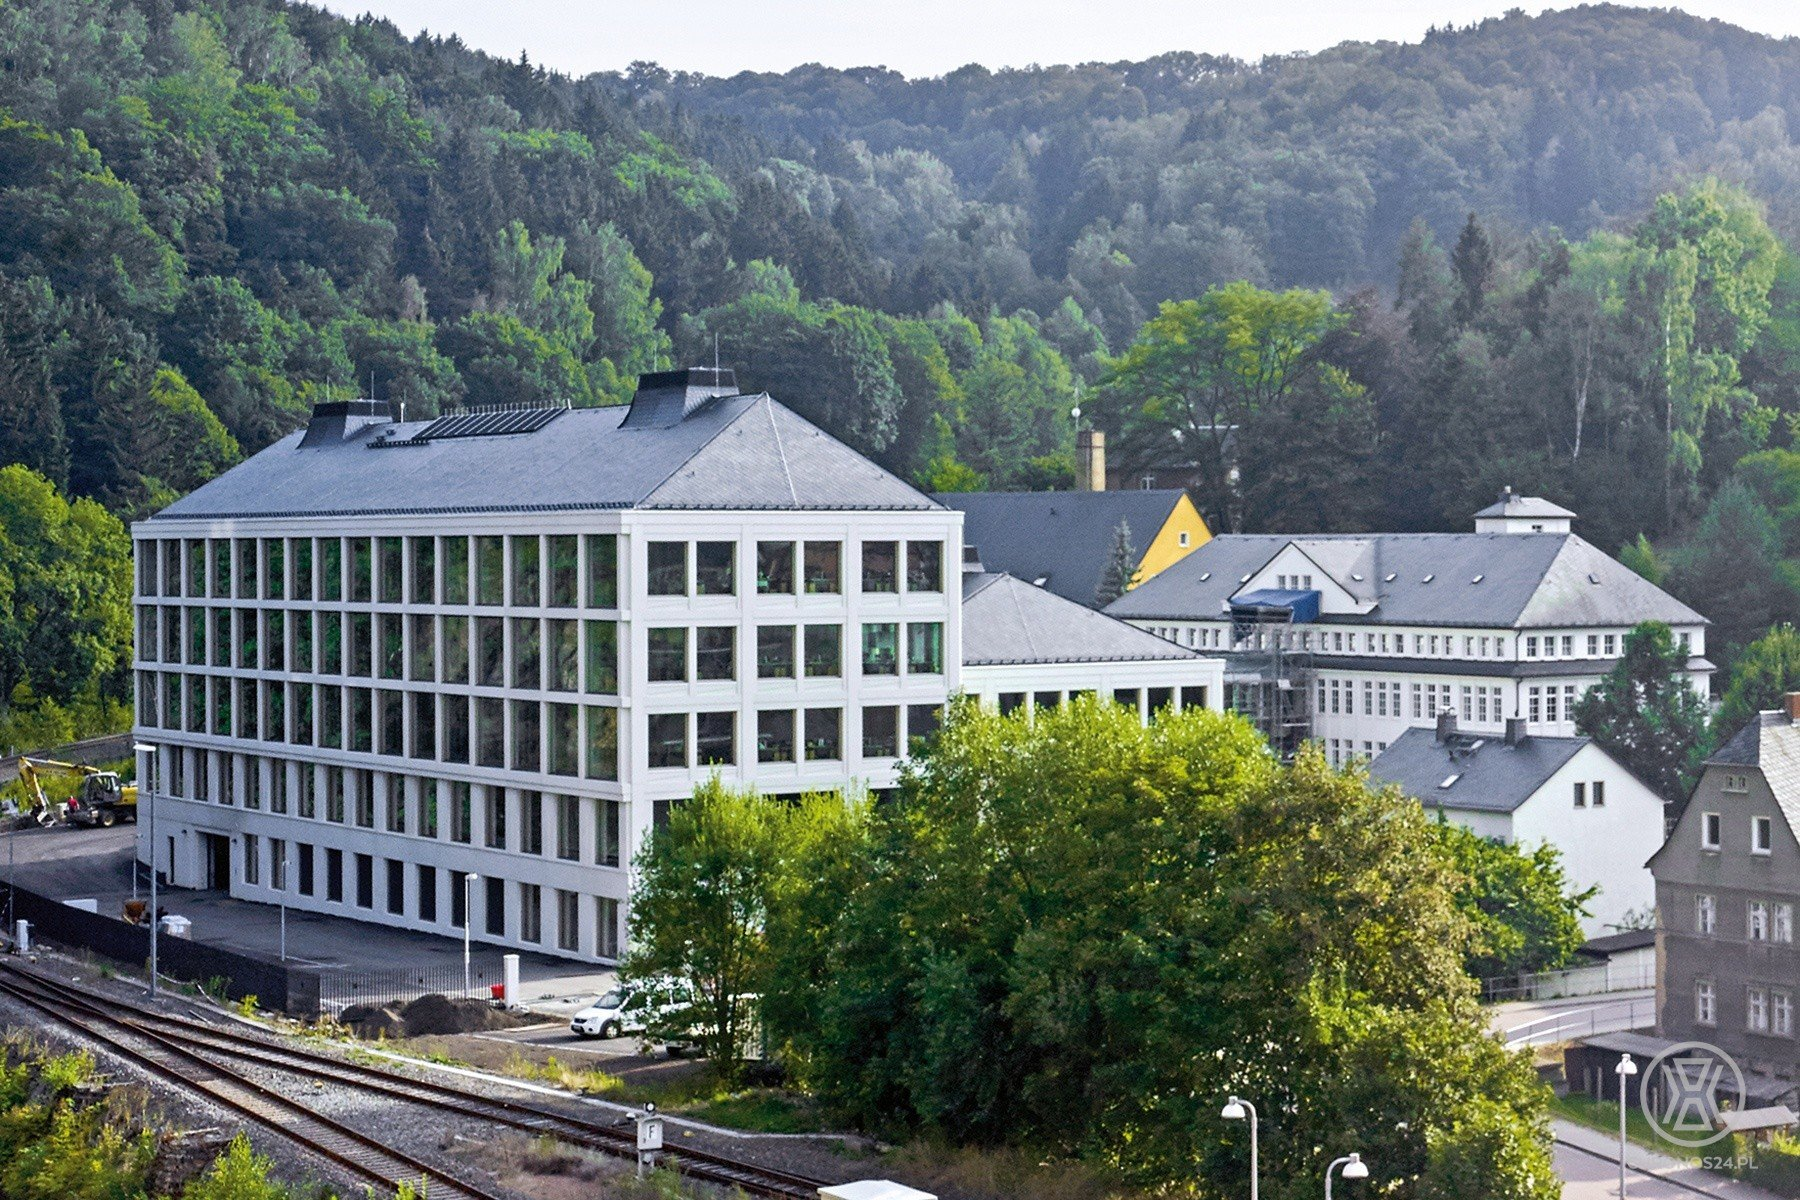 Nowy budynek manufaktury A. Lange & Söhne [live]